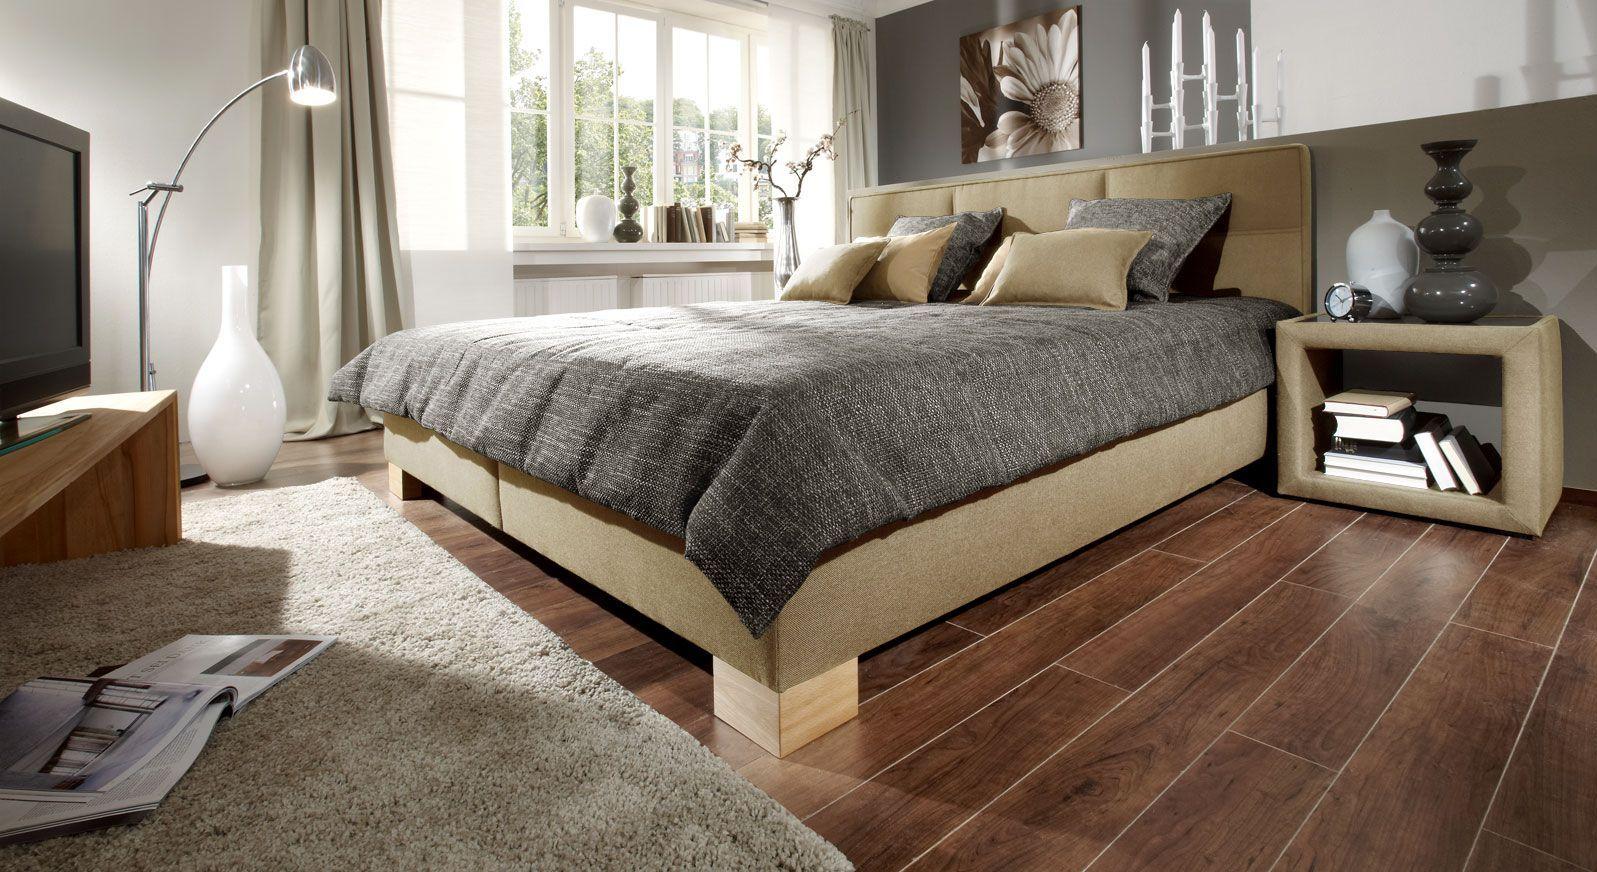 Full Size of Tagesdecke Bett Polsterbett Inklusive Matratze Und Lattenrost Quintino 200x200 Bambus Betten 200x220 160x200 Mit Sofa Bettkasten Ausklappbar Somnus Stapelbar Bett Tagesdecke Bett